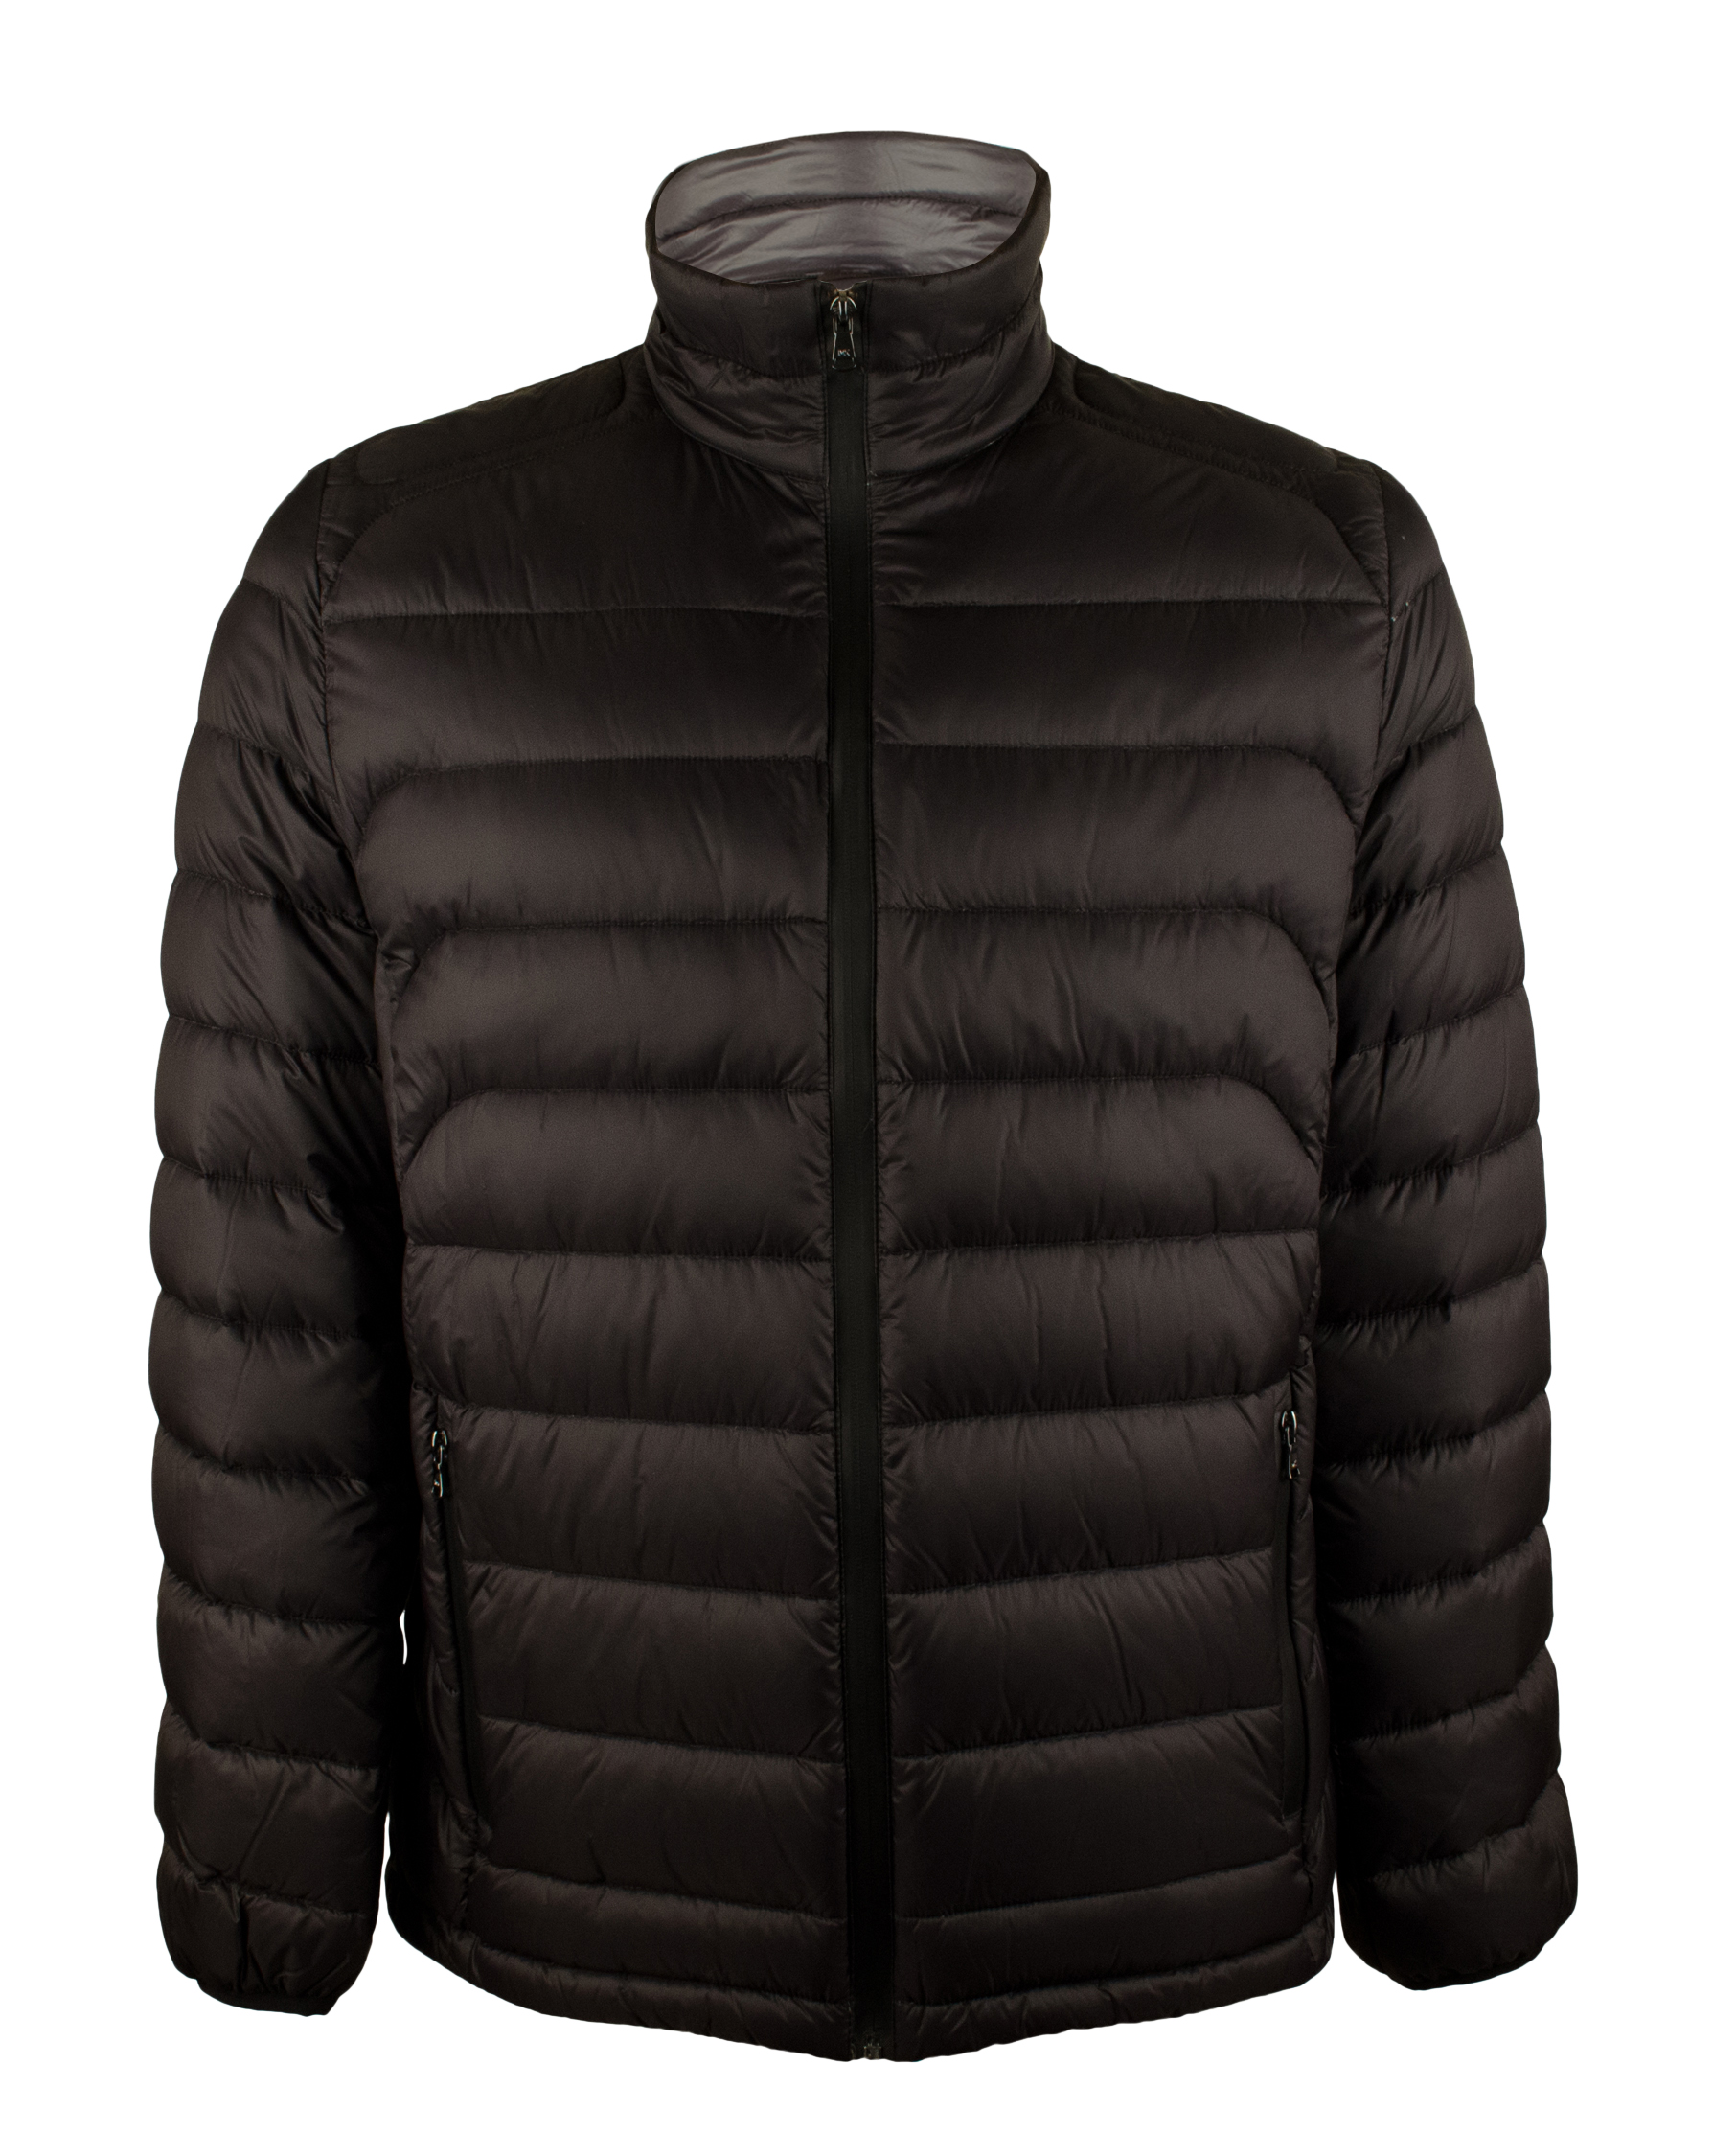 michael kors men 39 s puffer down coats ebay. Black Bedroom Furniture Sets. Home Design Ideas